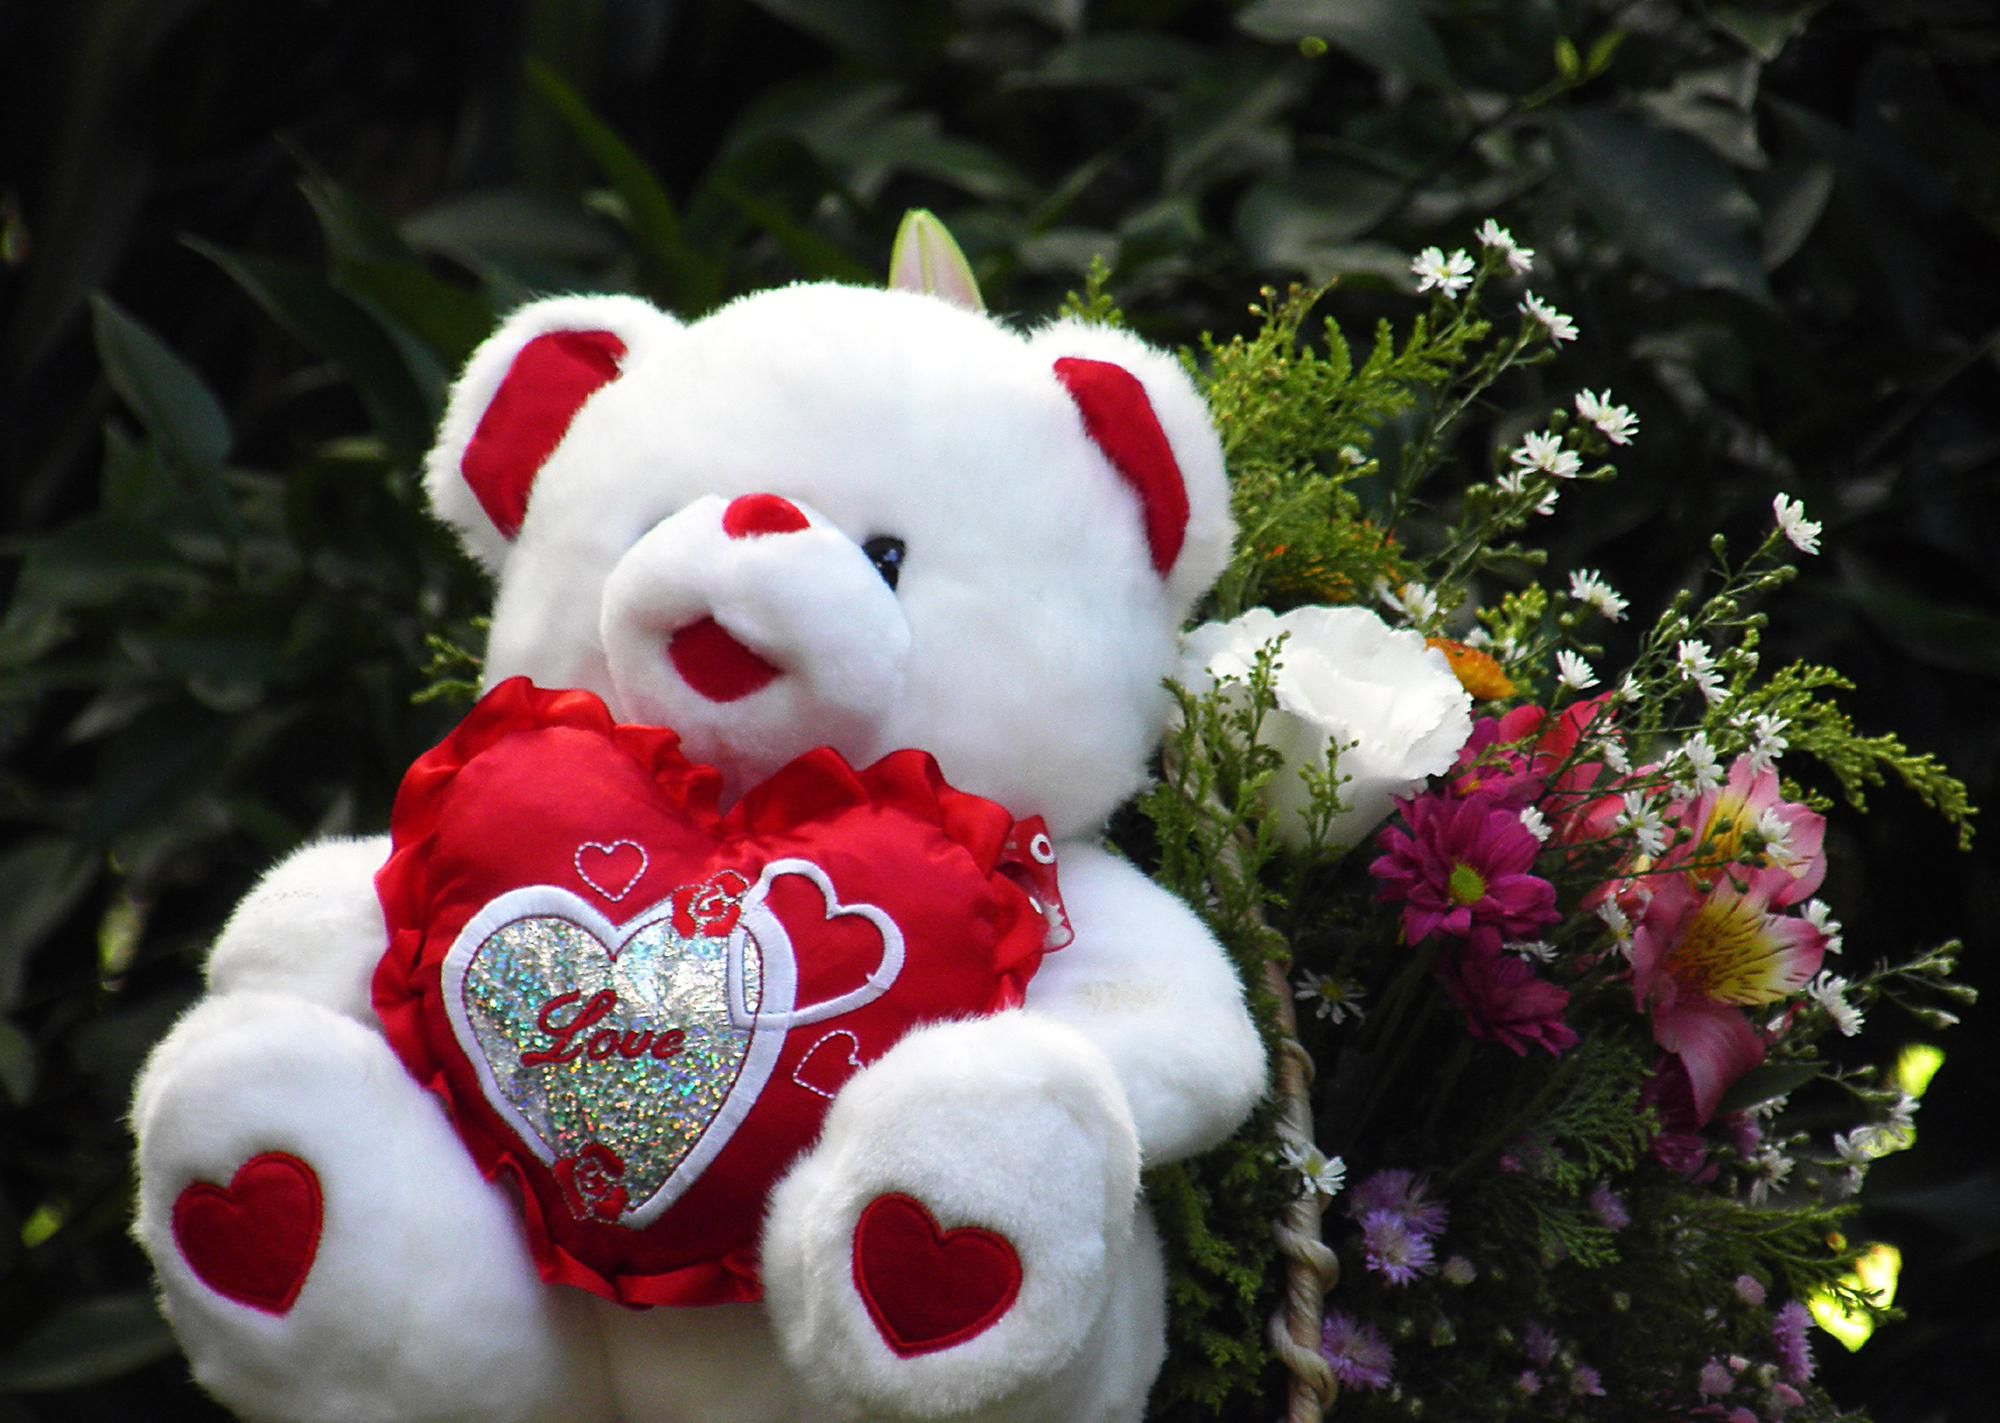 Hd Lovely Teddy Bear Wallpaper Peluches Teddy Bear Cute Teddy